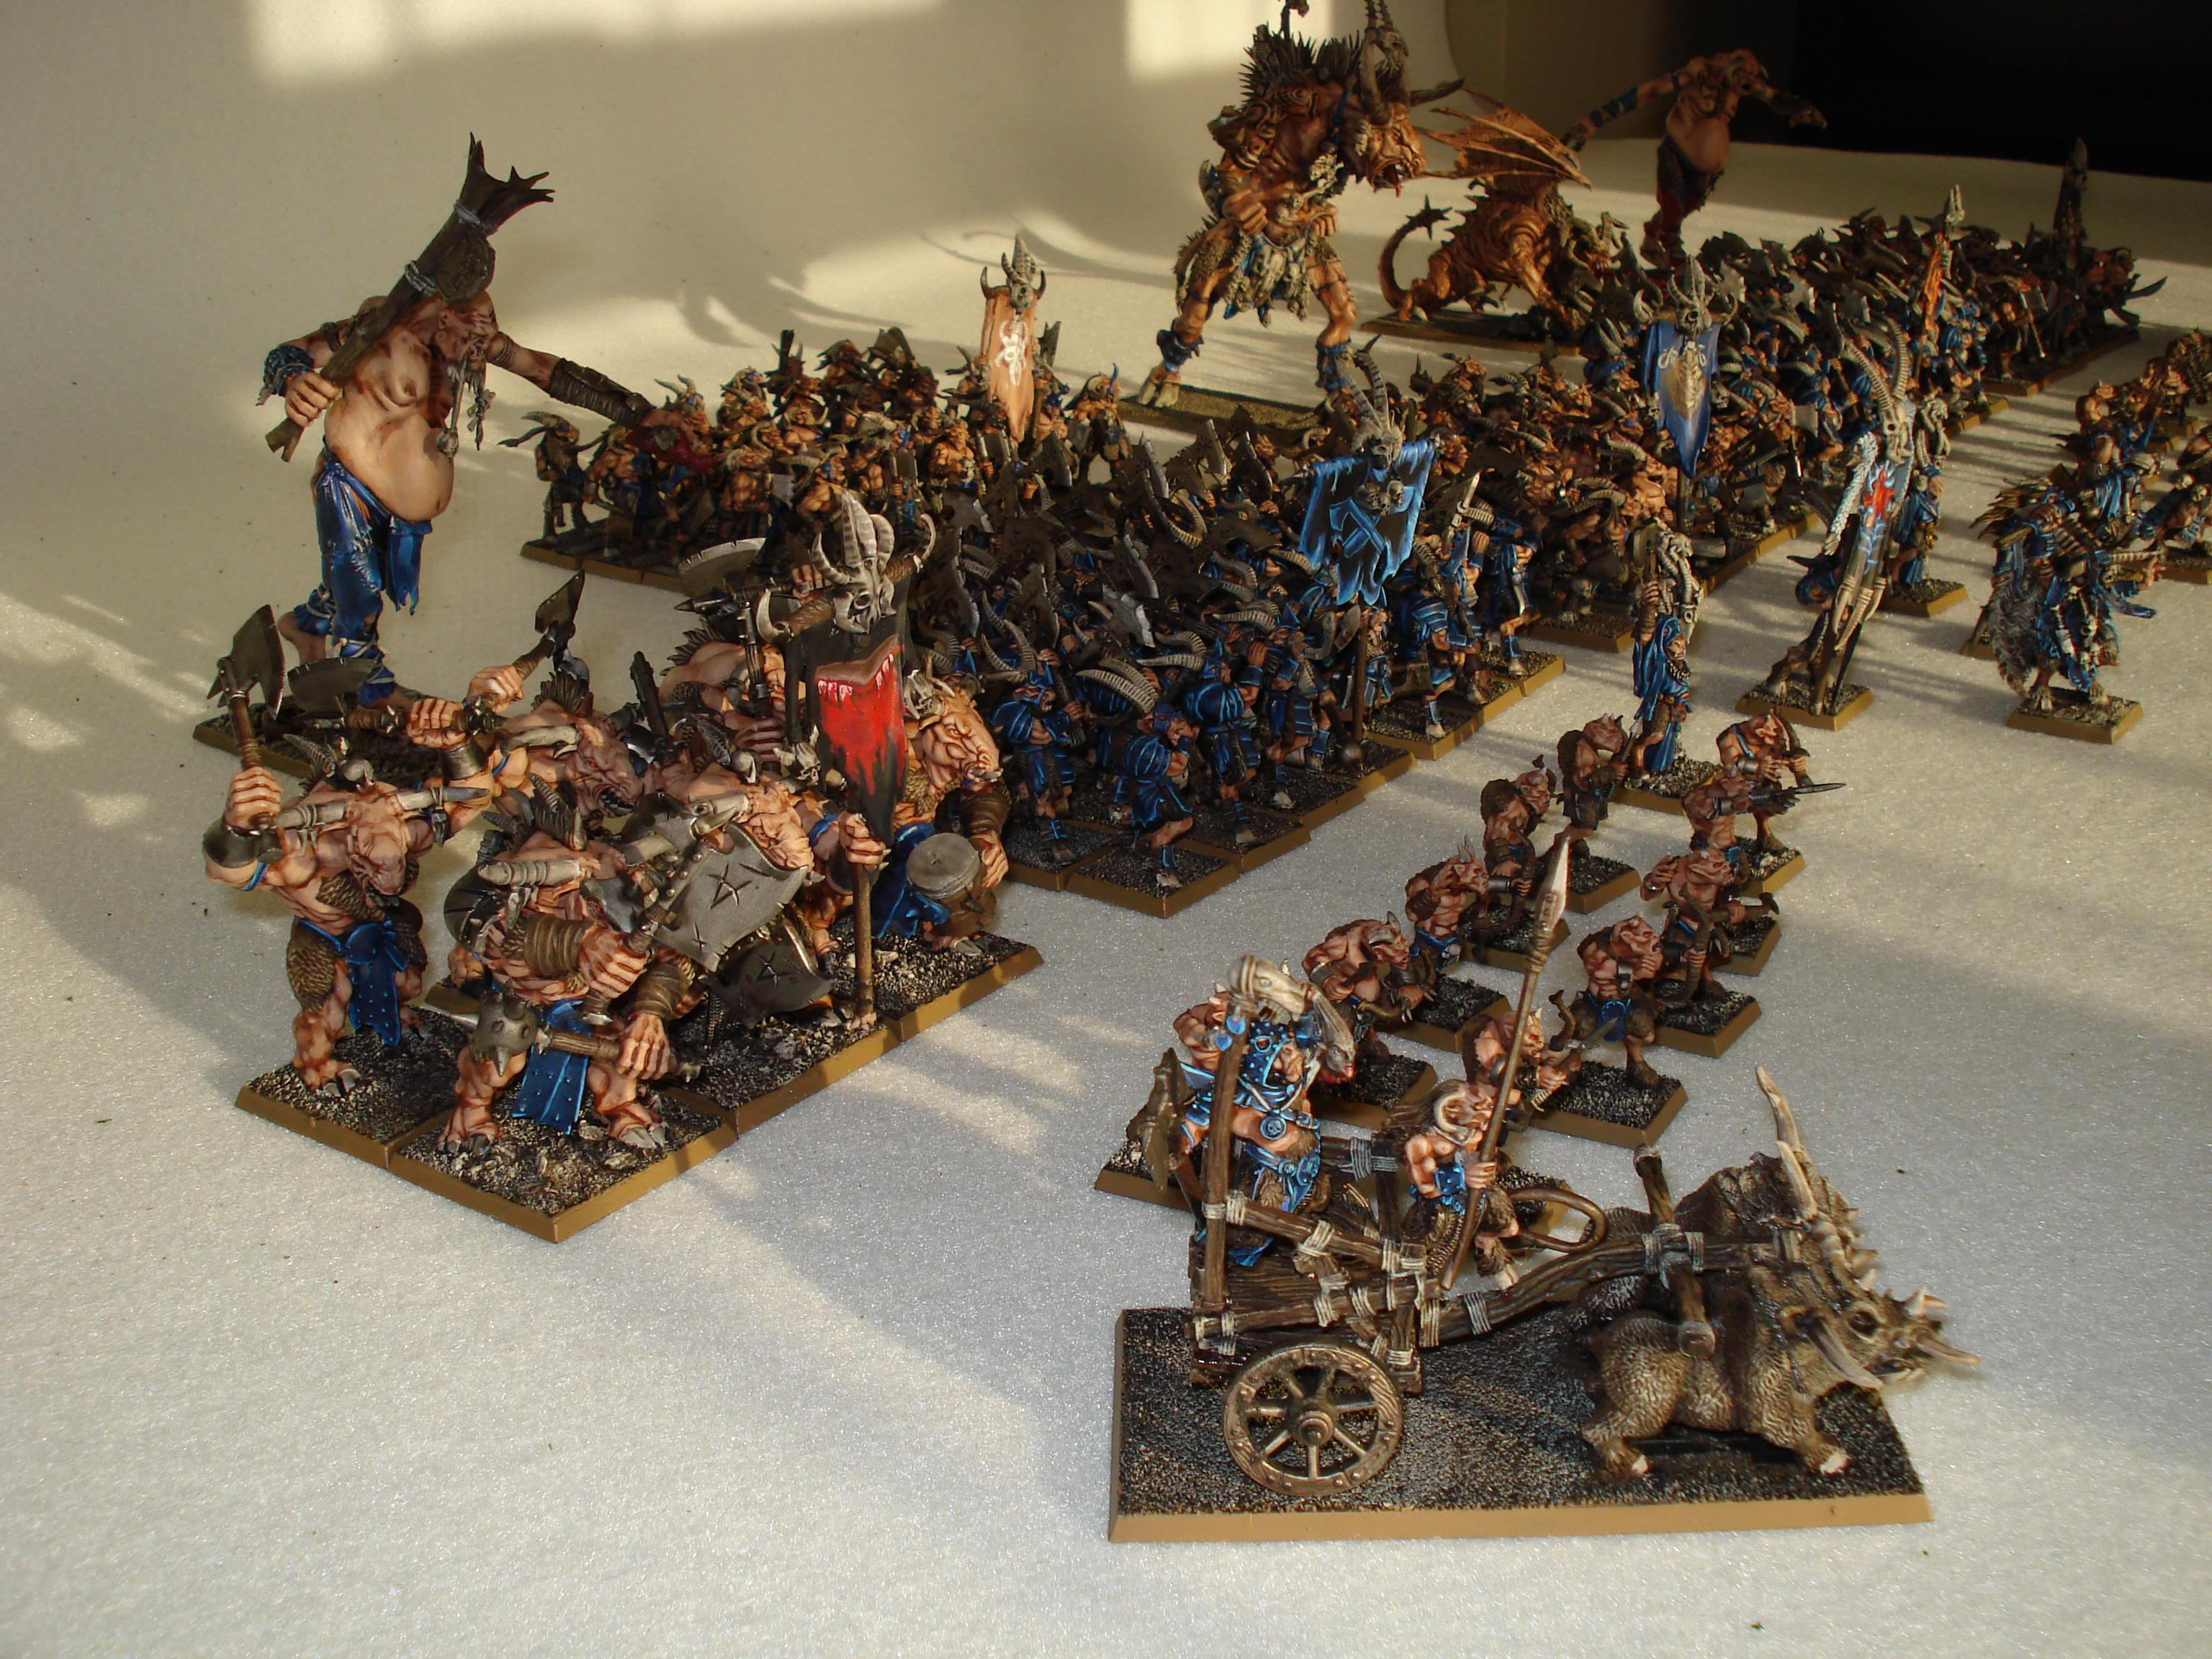 Army, Beastmen, Chariot, Finished, Giant, Shaman, Standard Bearer, Tuskgor, Ungors